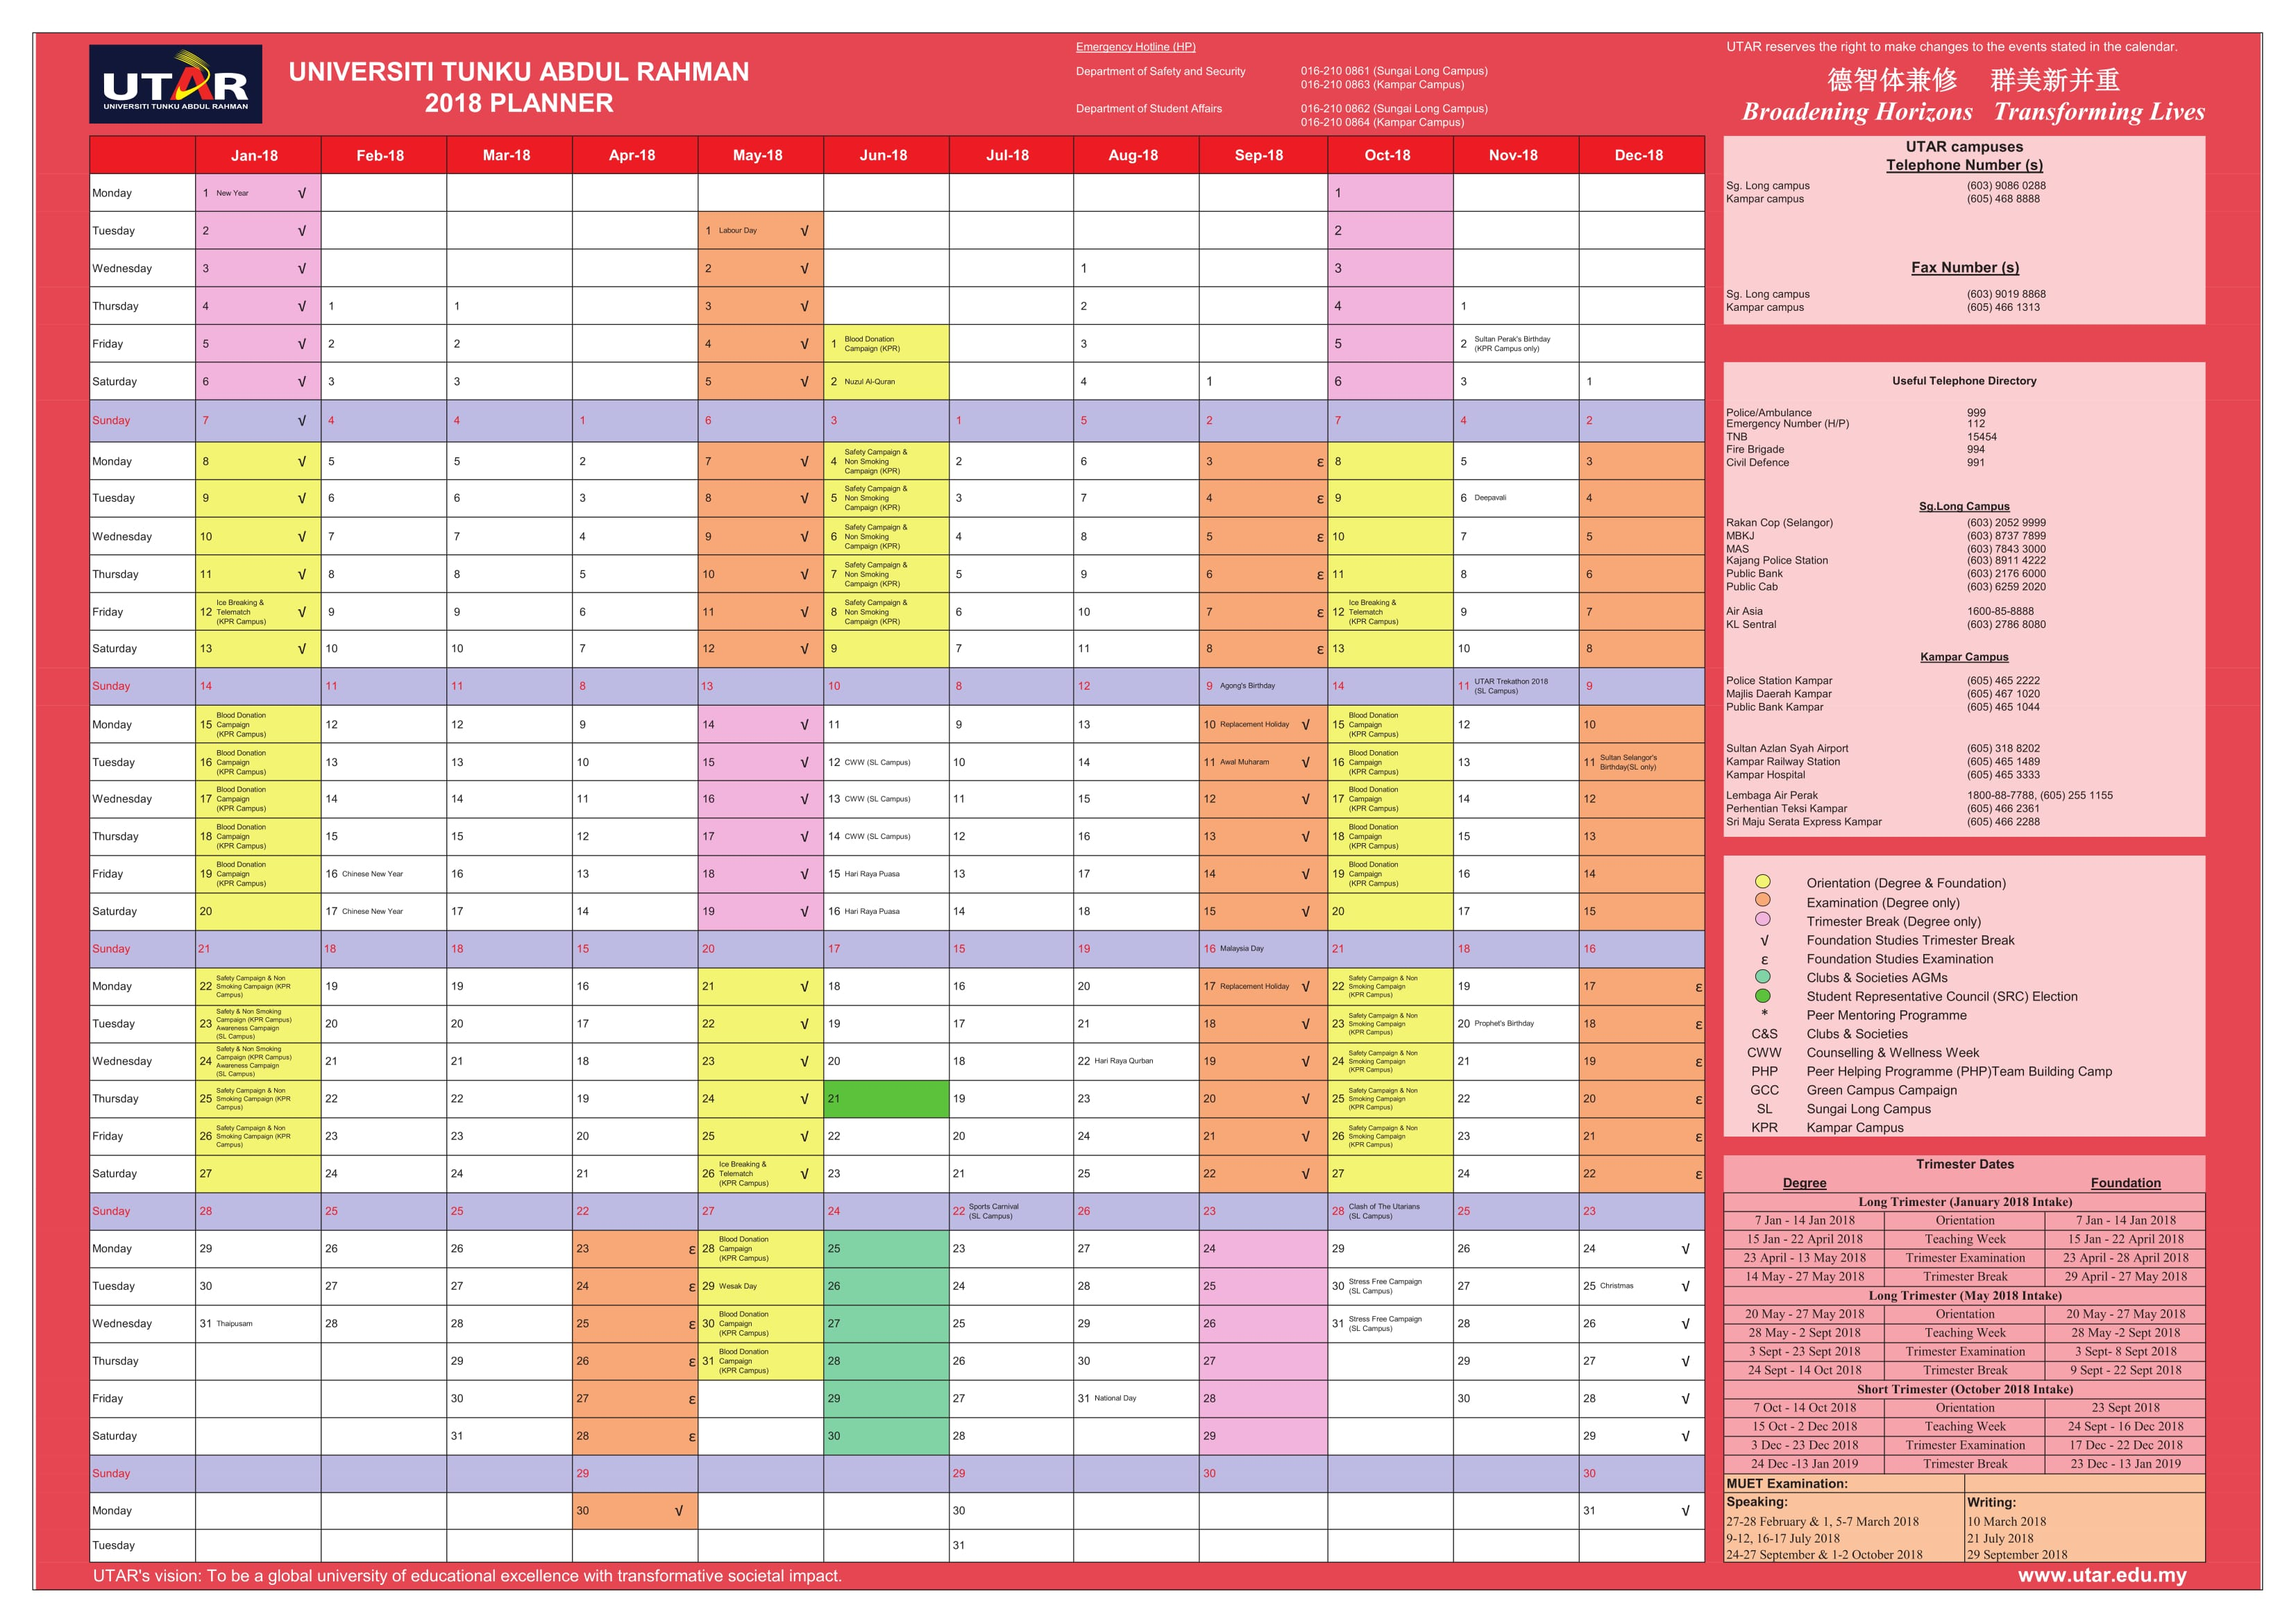 Utar Calendar Planner : Academic planners gecce tackletarts